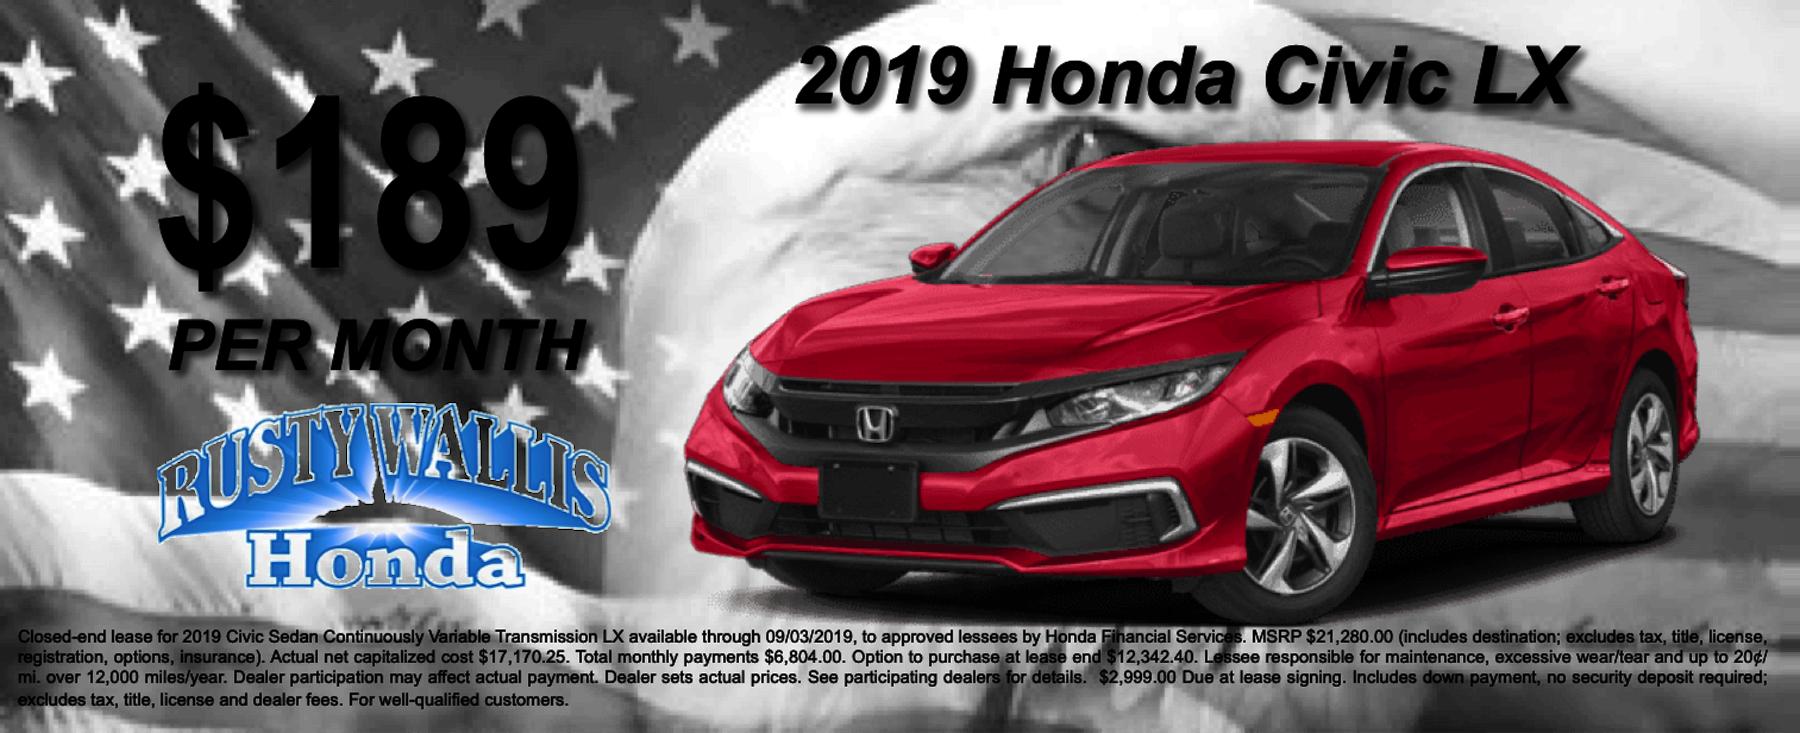 Auto City Dallas Tx >> Rusty Wallis Honda Honda Dealer In Dallas Tx